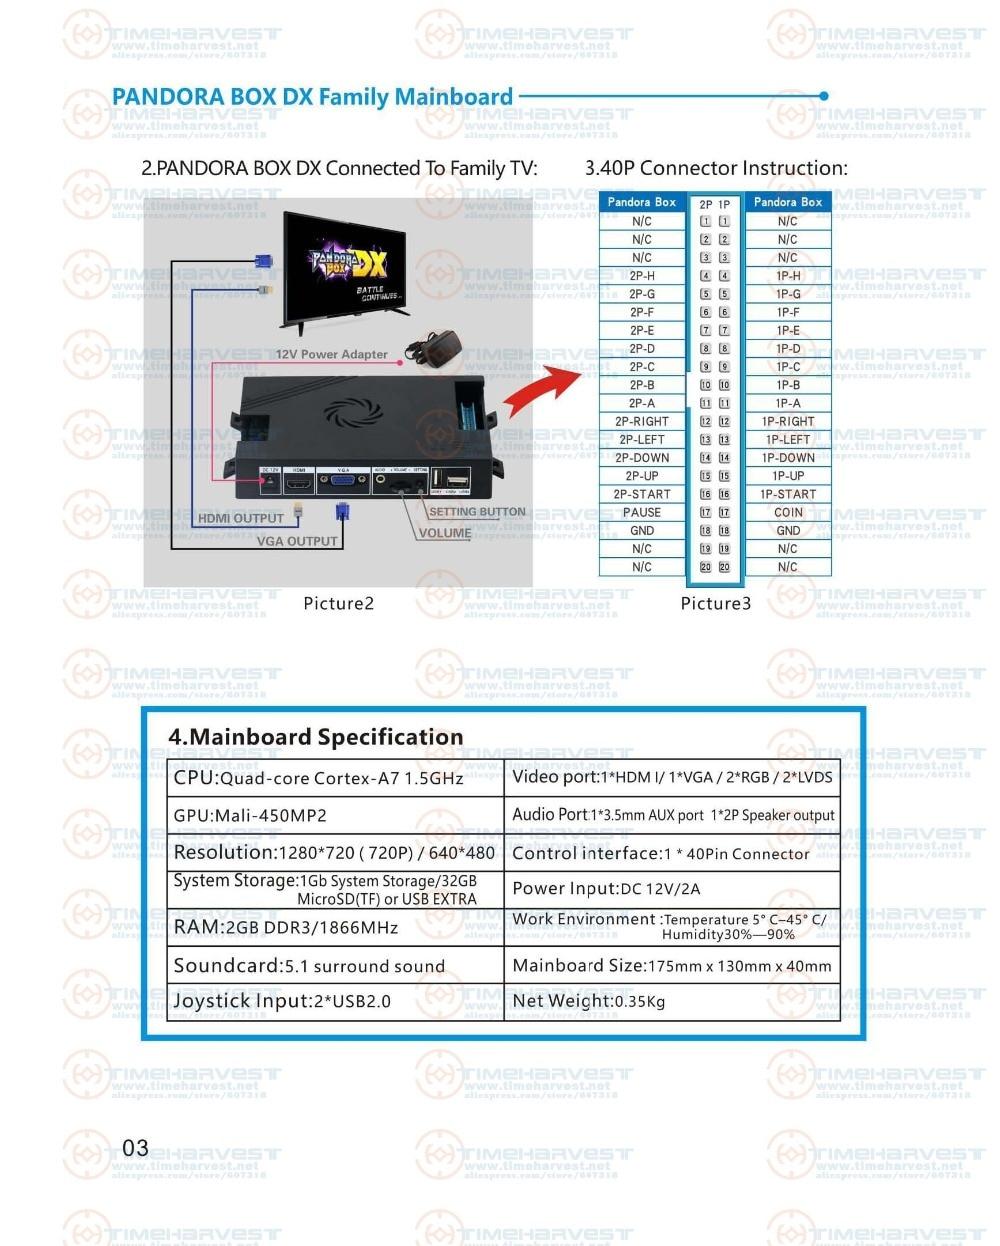 pbdx user manual 1.0_页面_04